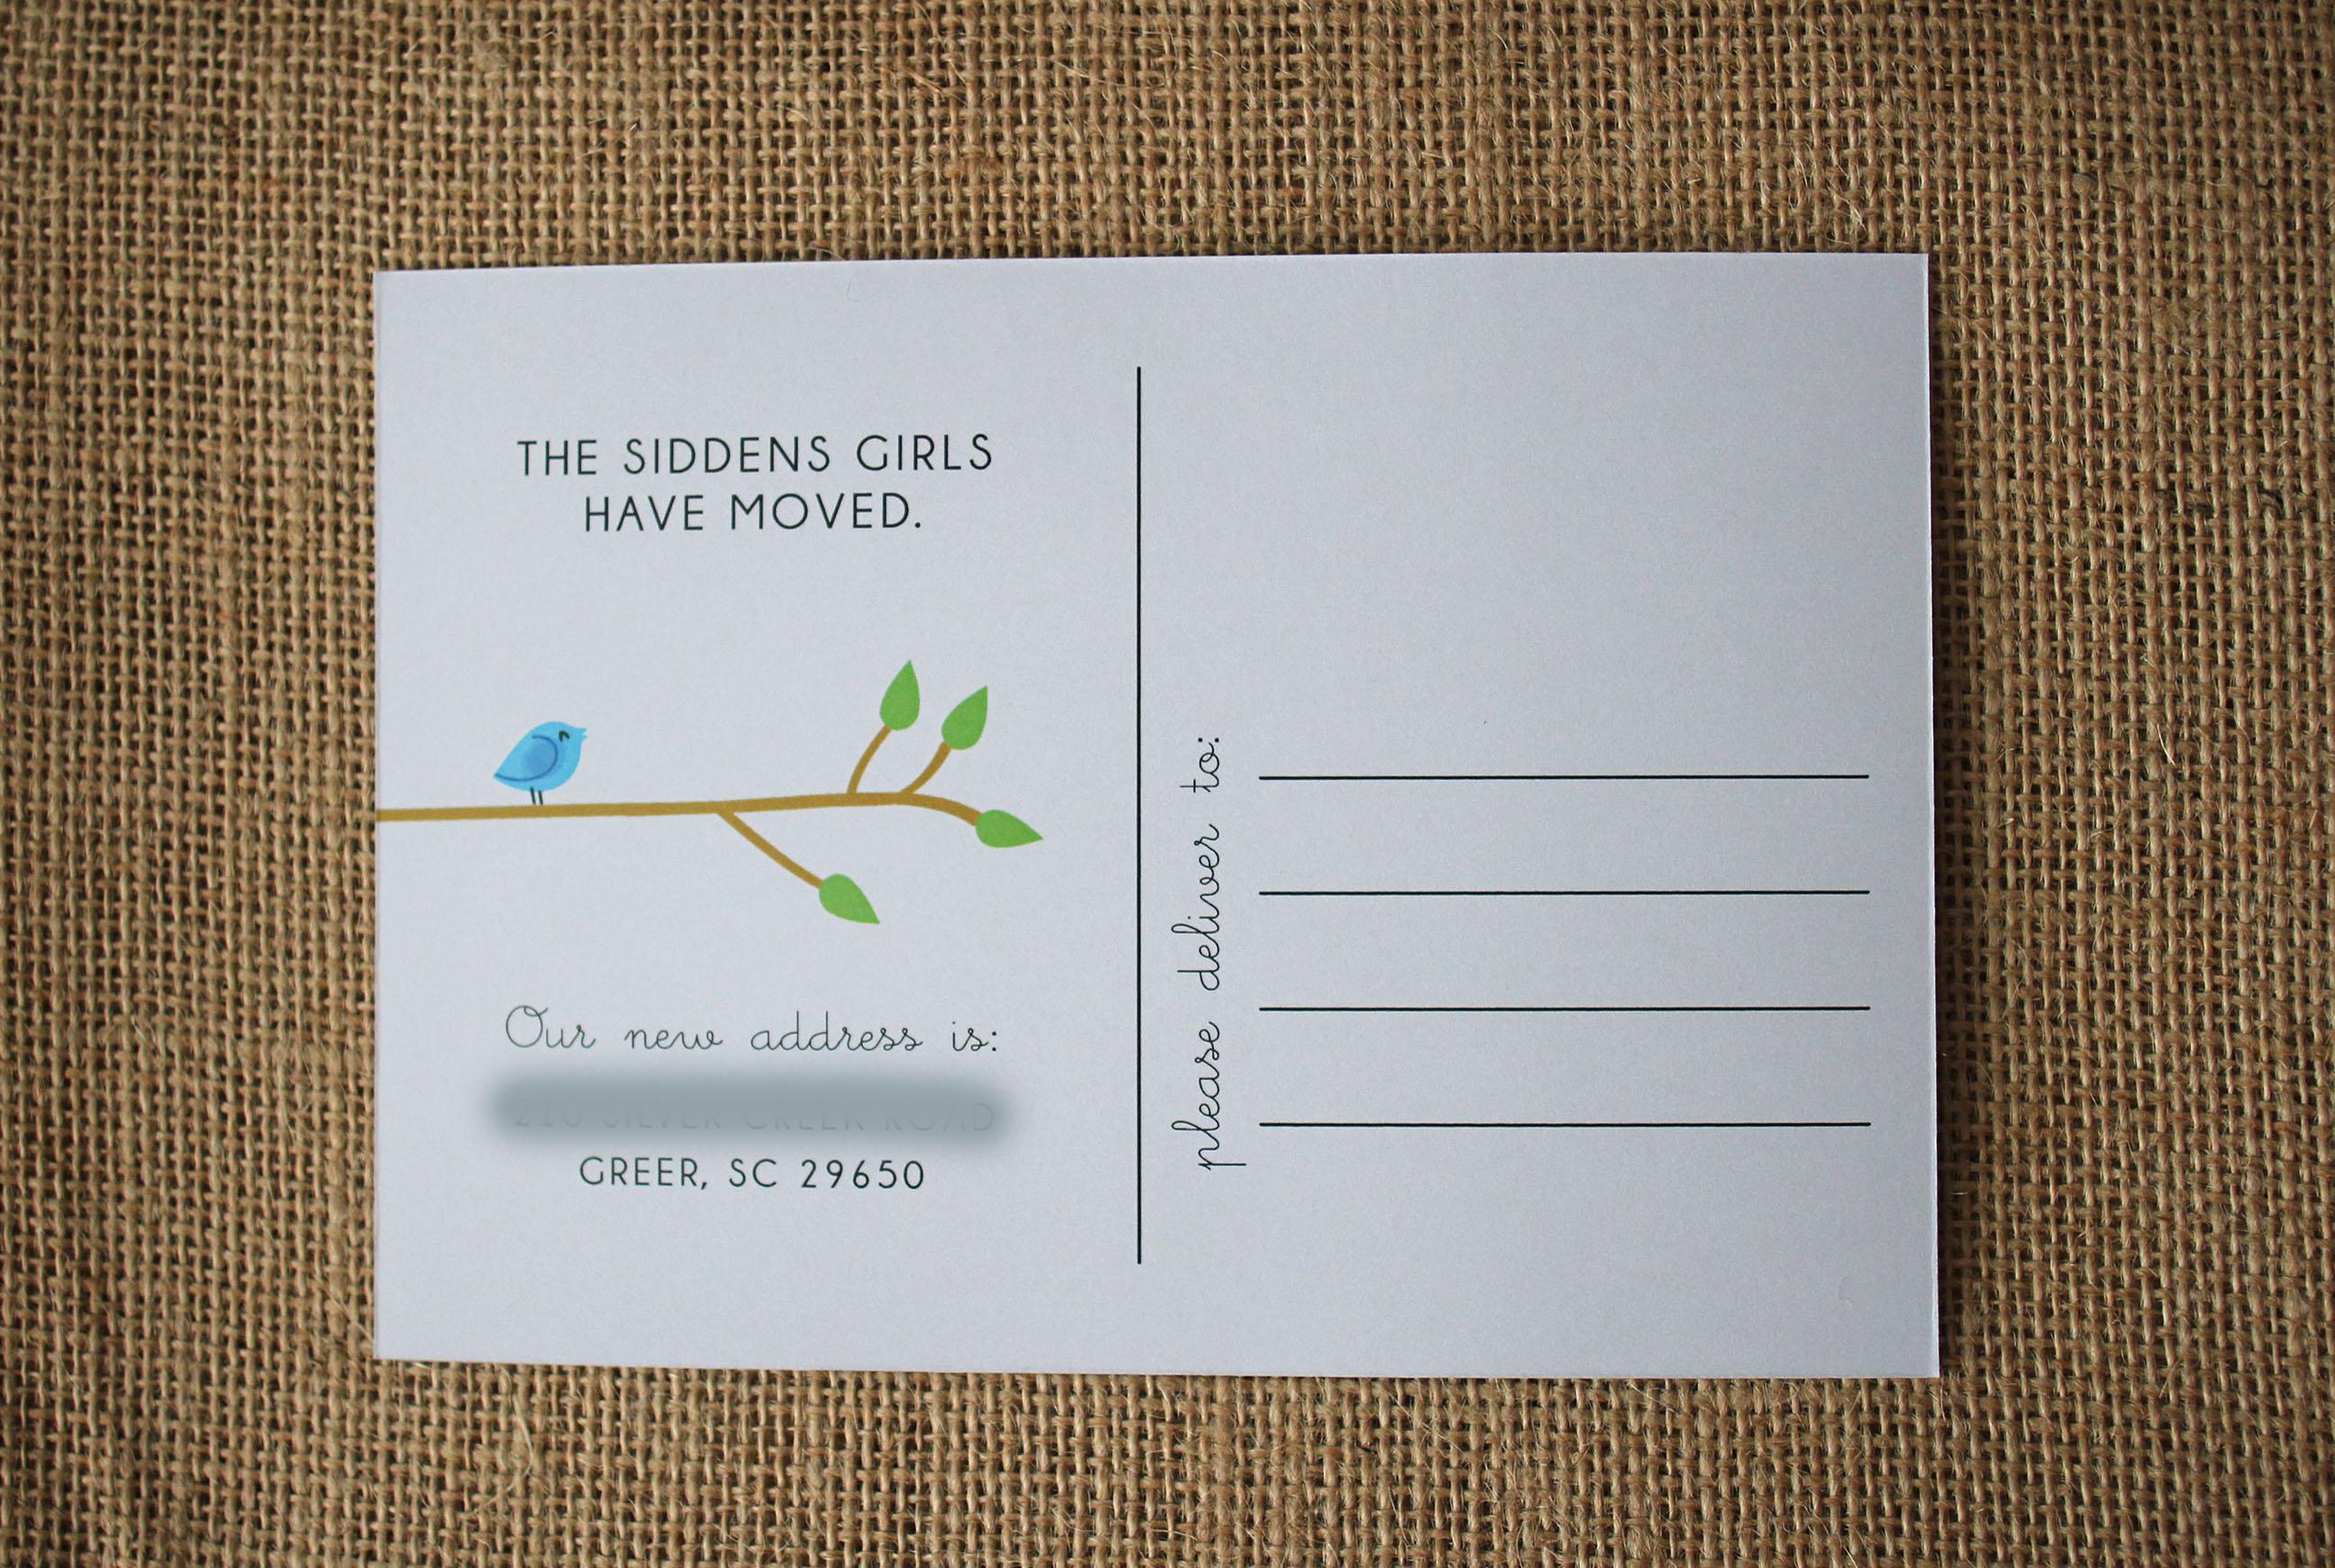 change of address postcard lucy zeiger